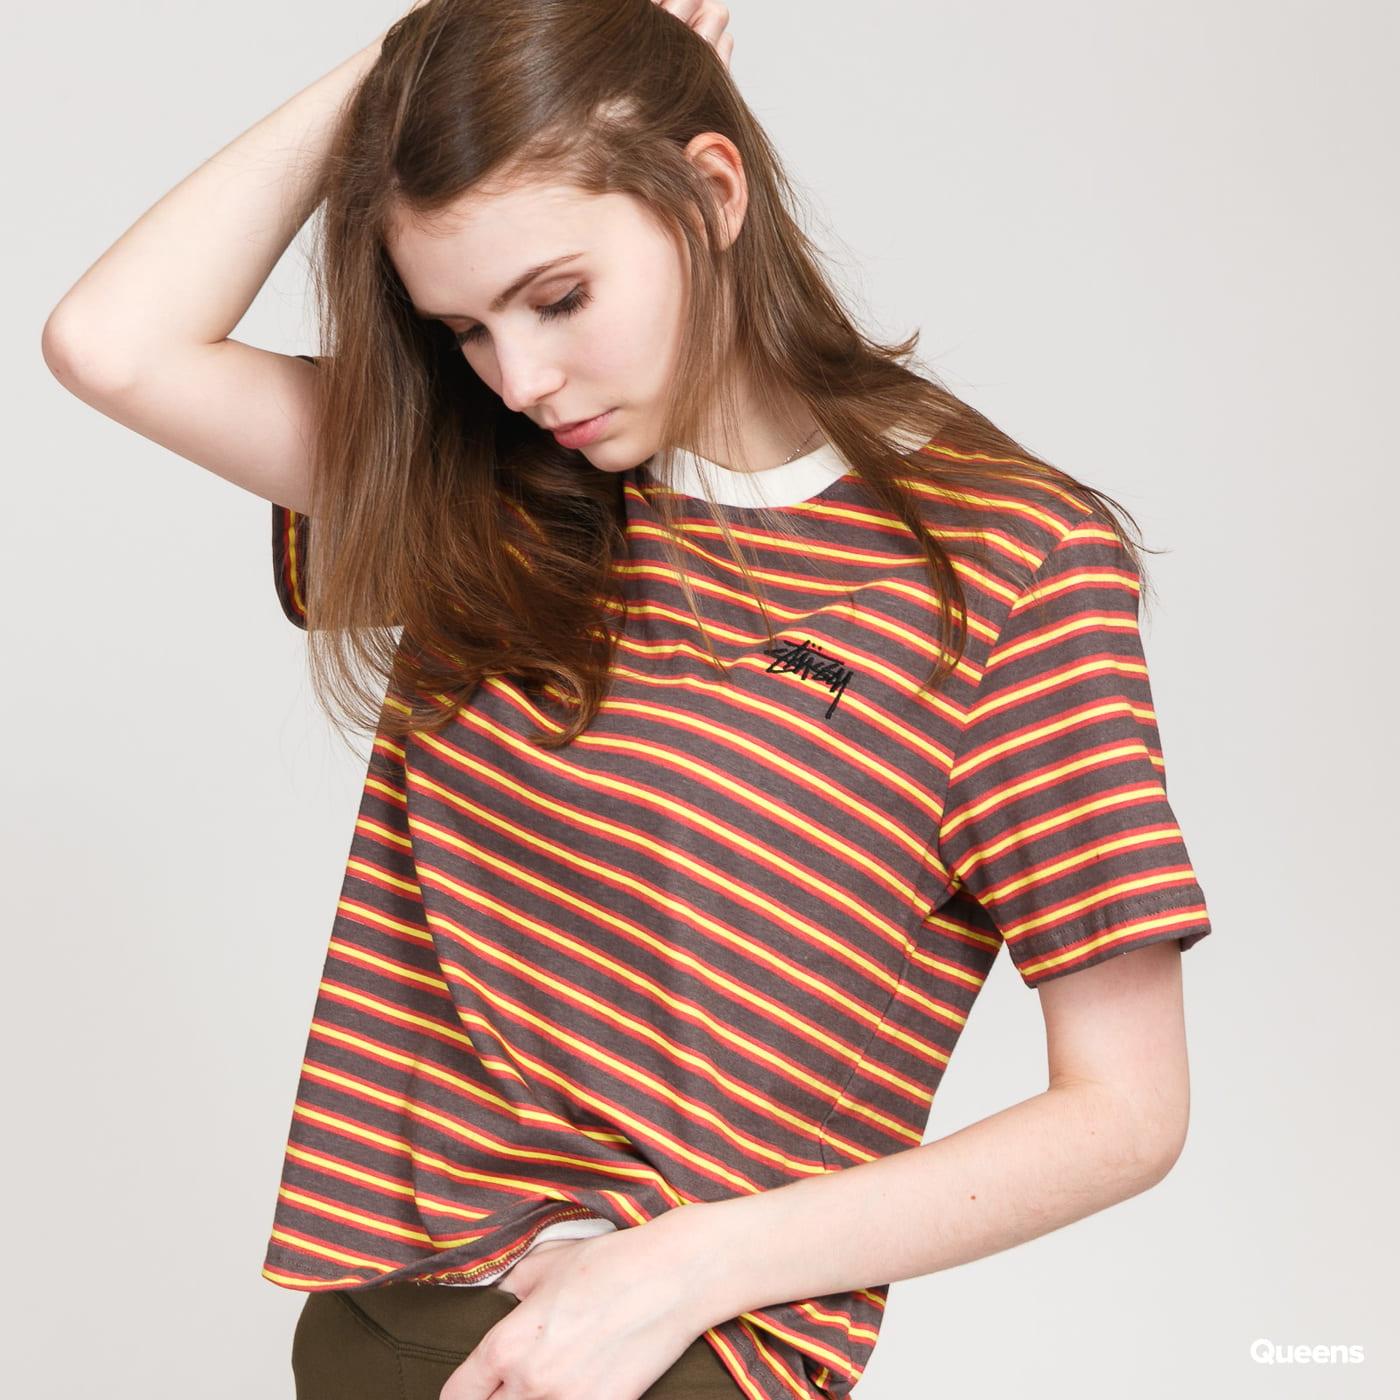 Stüssy Printed Stripe Tee dark brown / red / yellow